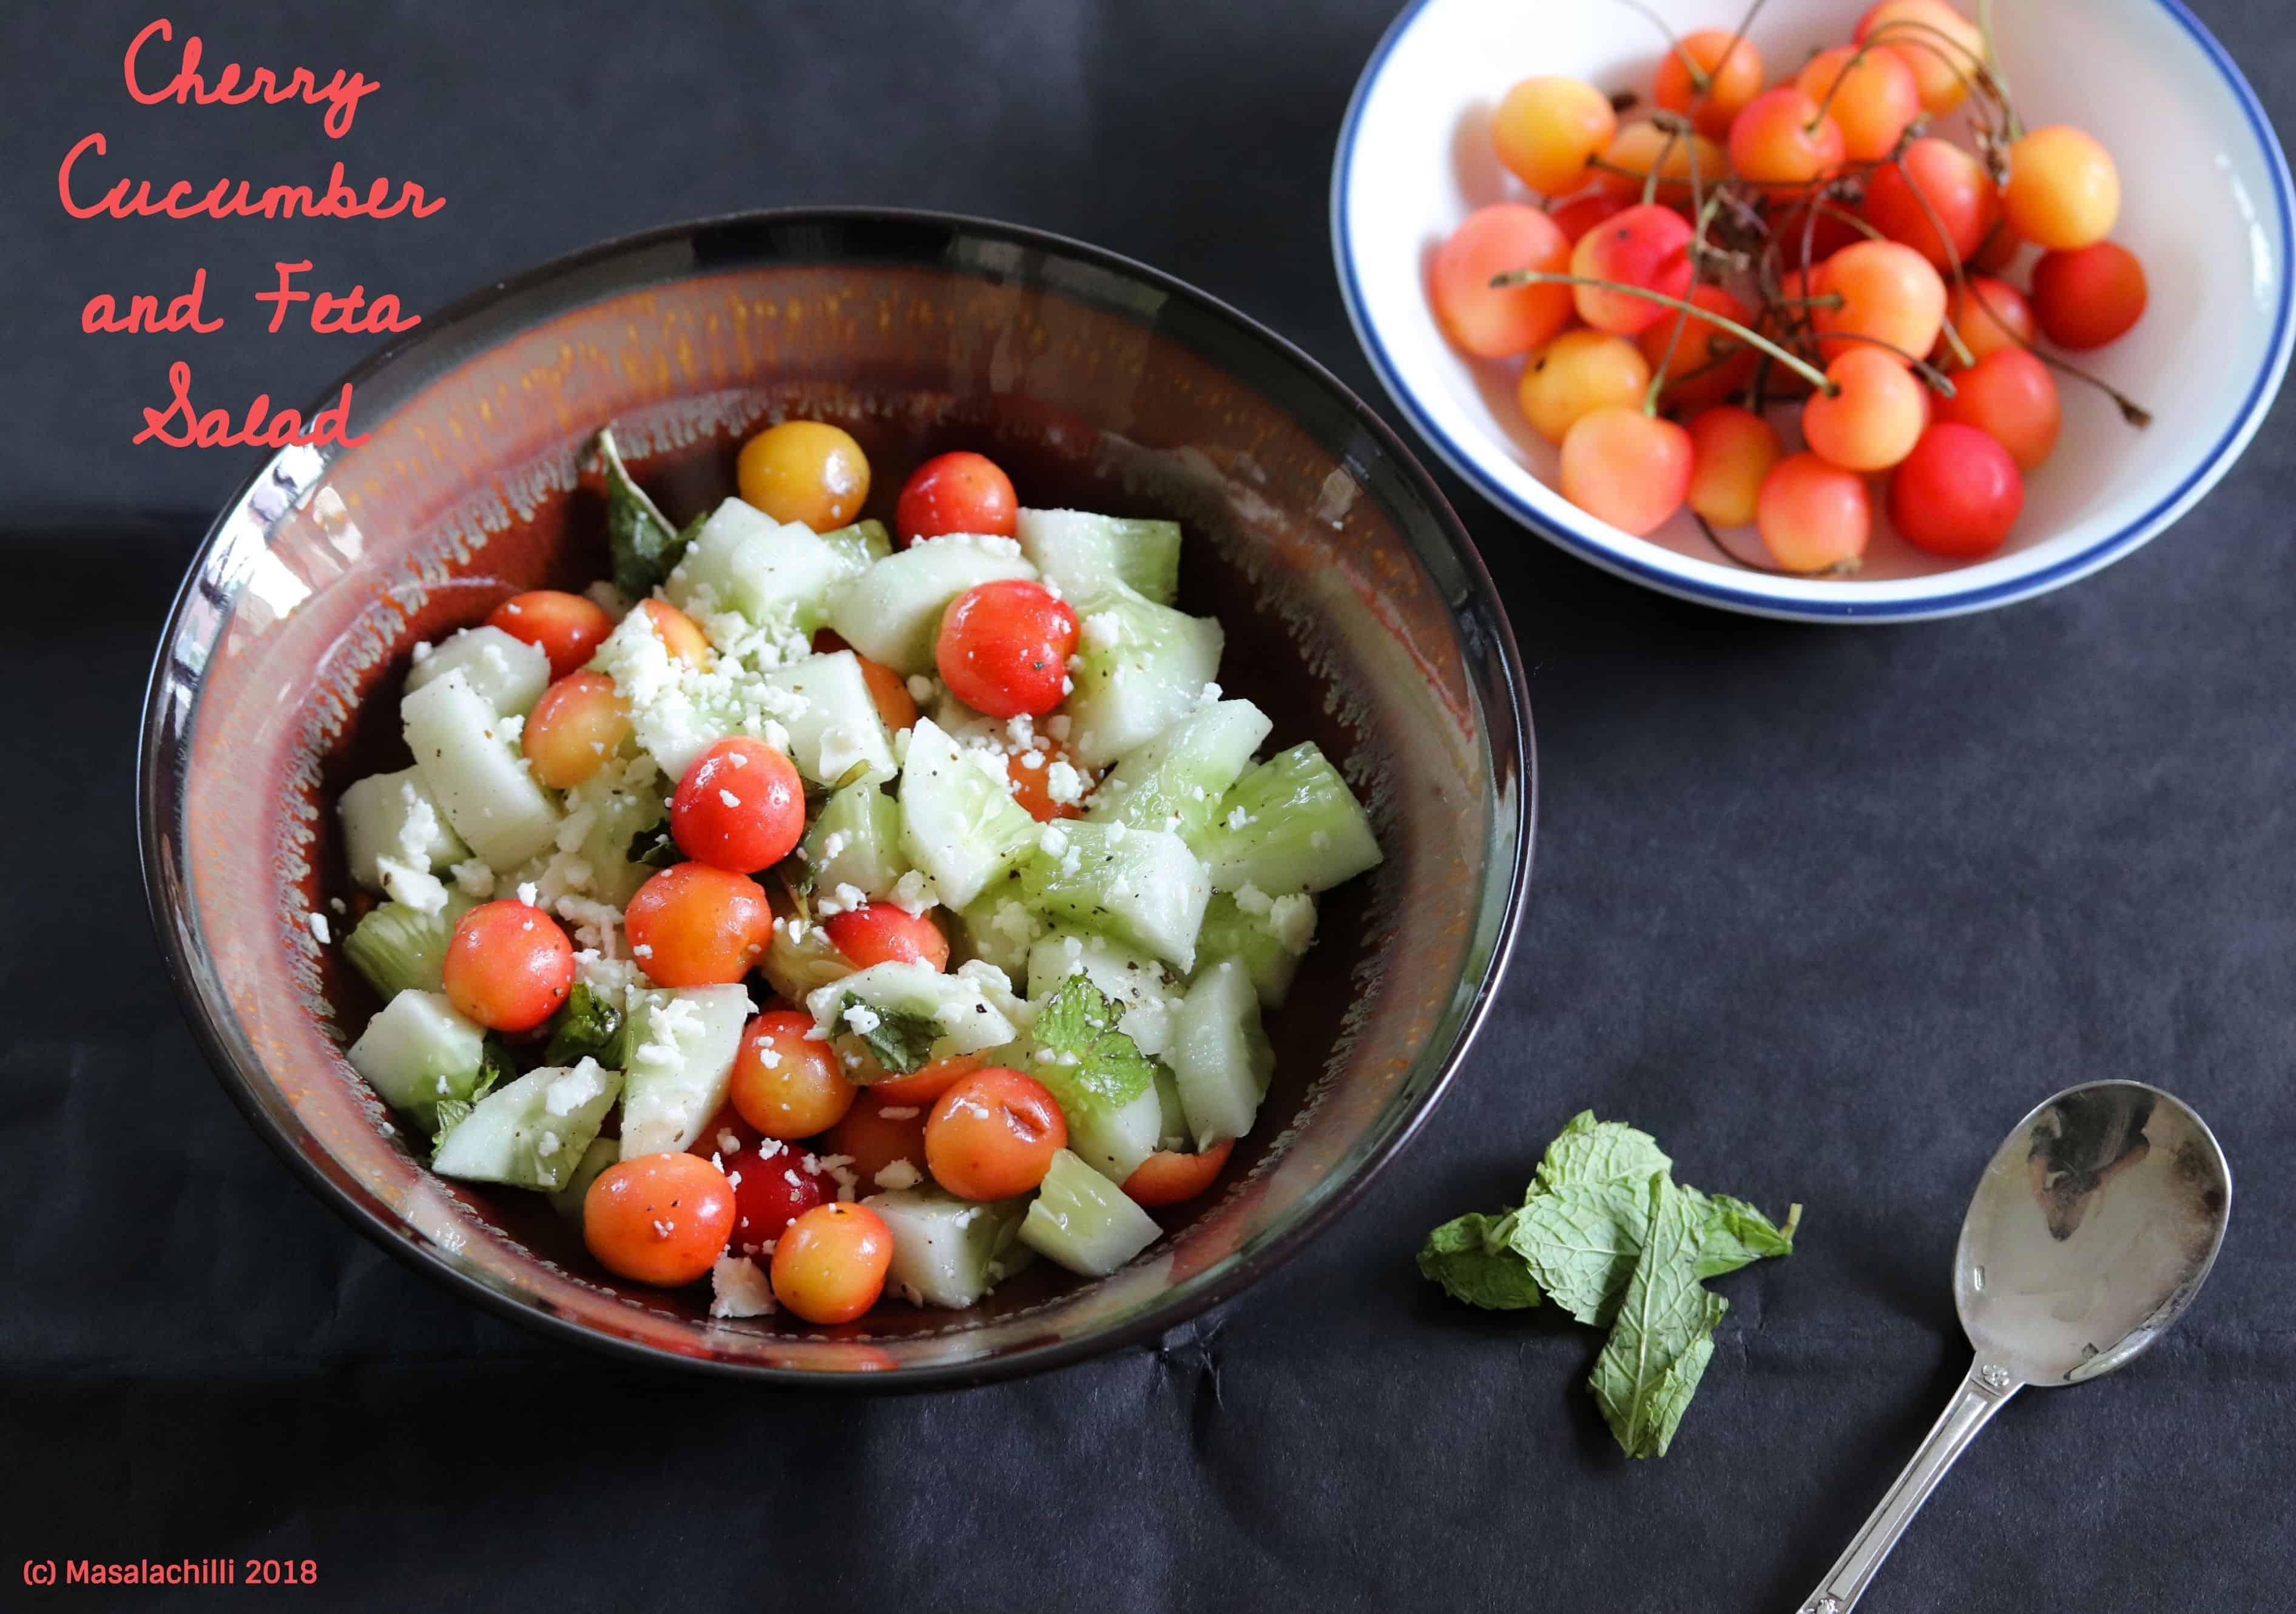 Cherry Cucumber and Feta Salad